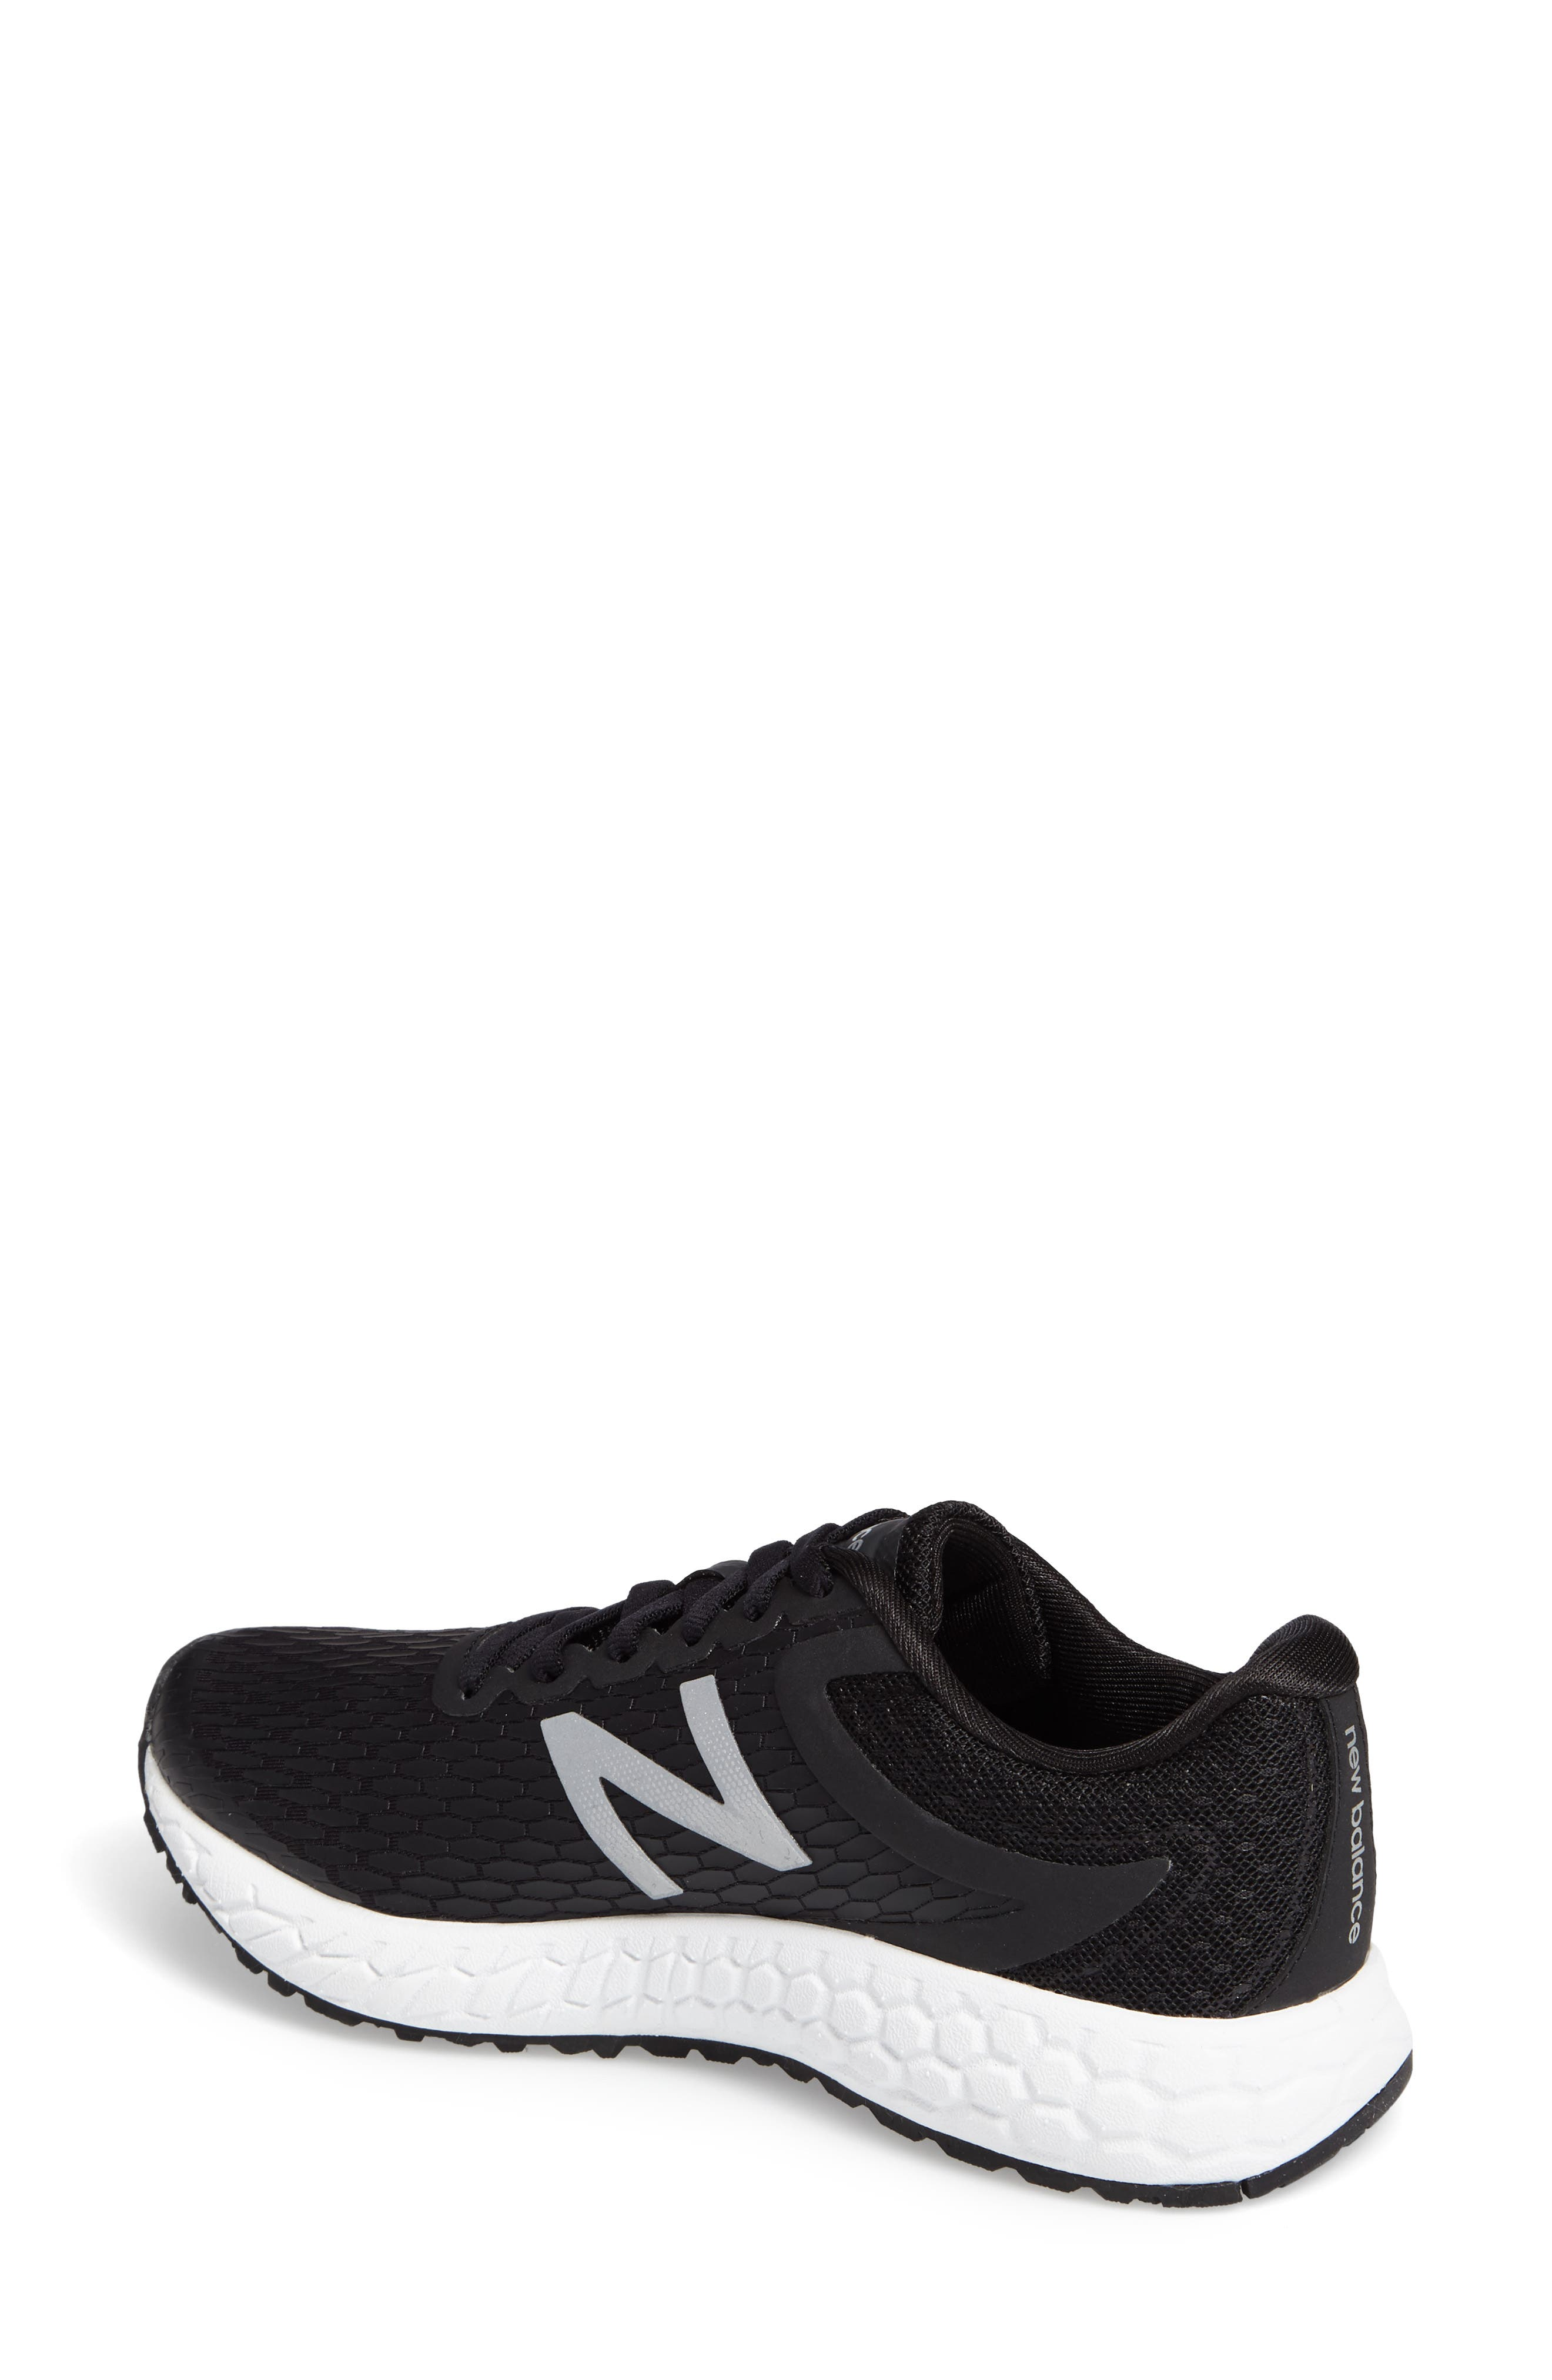 Alternate Image 2  - New Balance '980 - Fresh Foam Boracay' Running Shoe (Women)